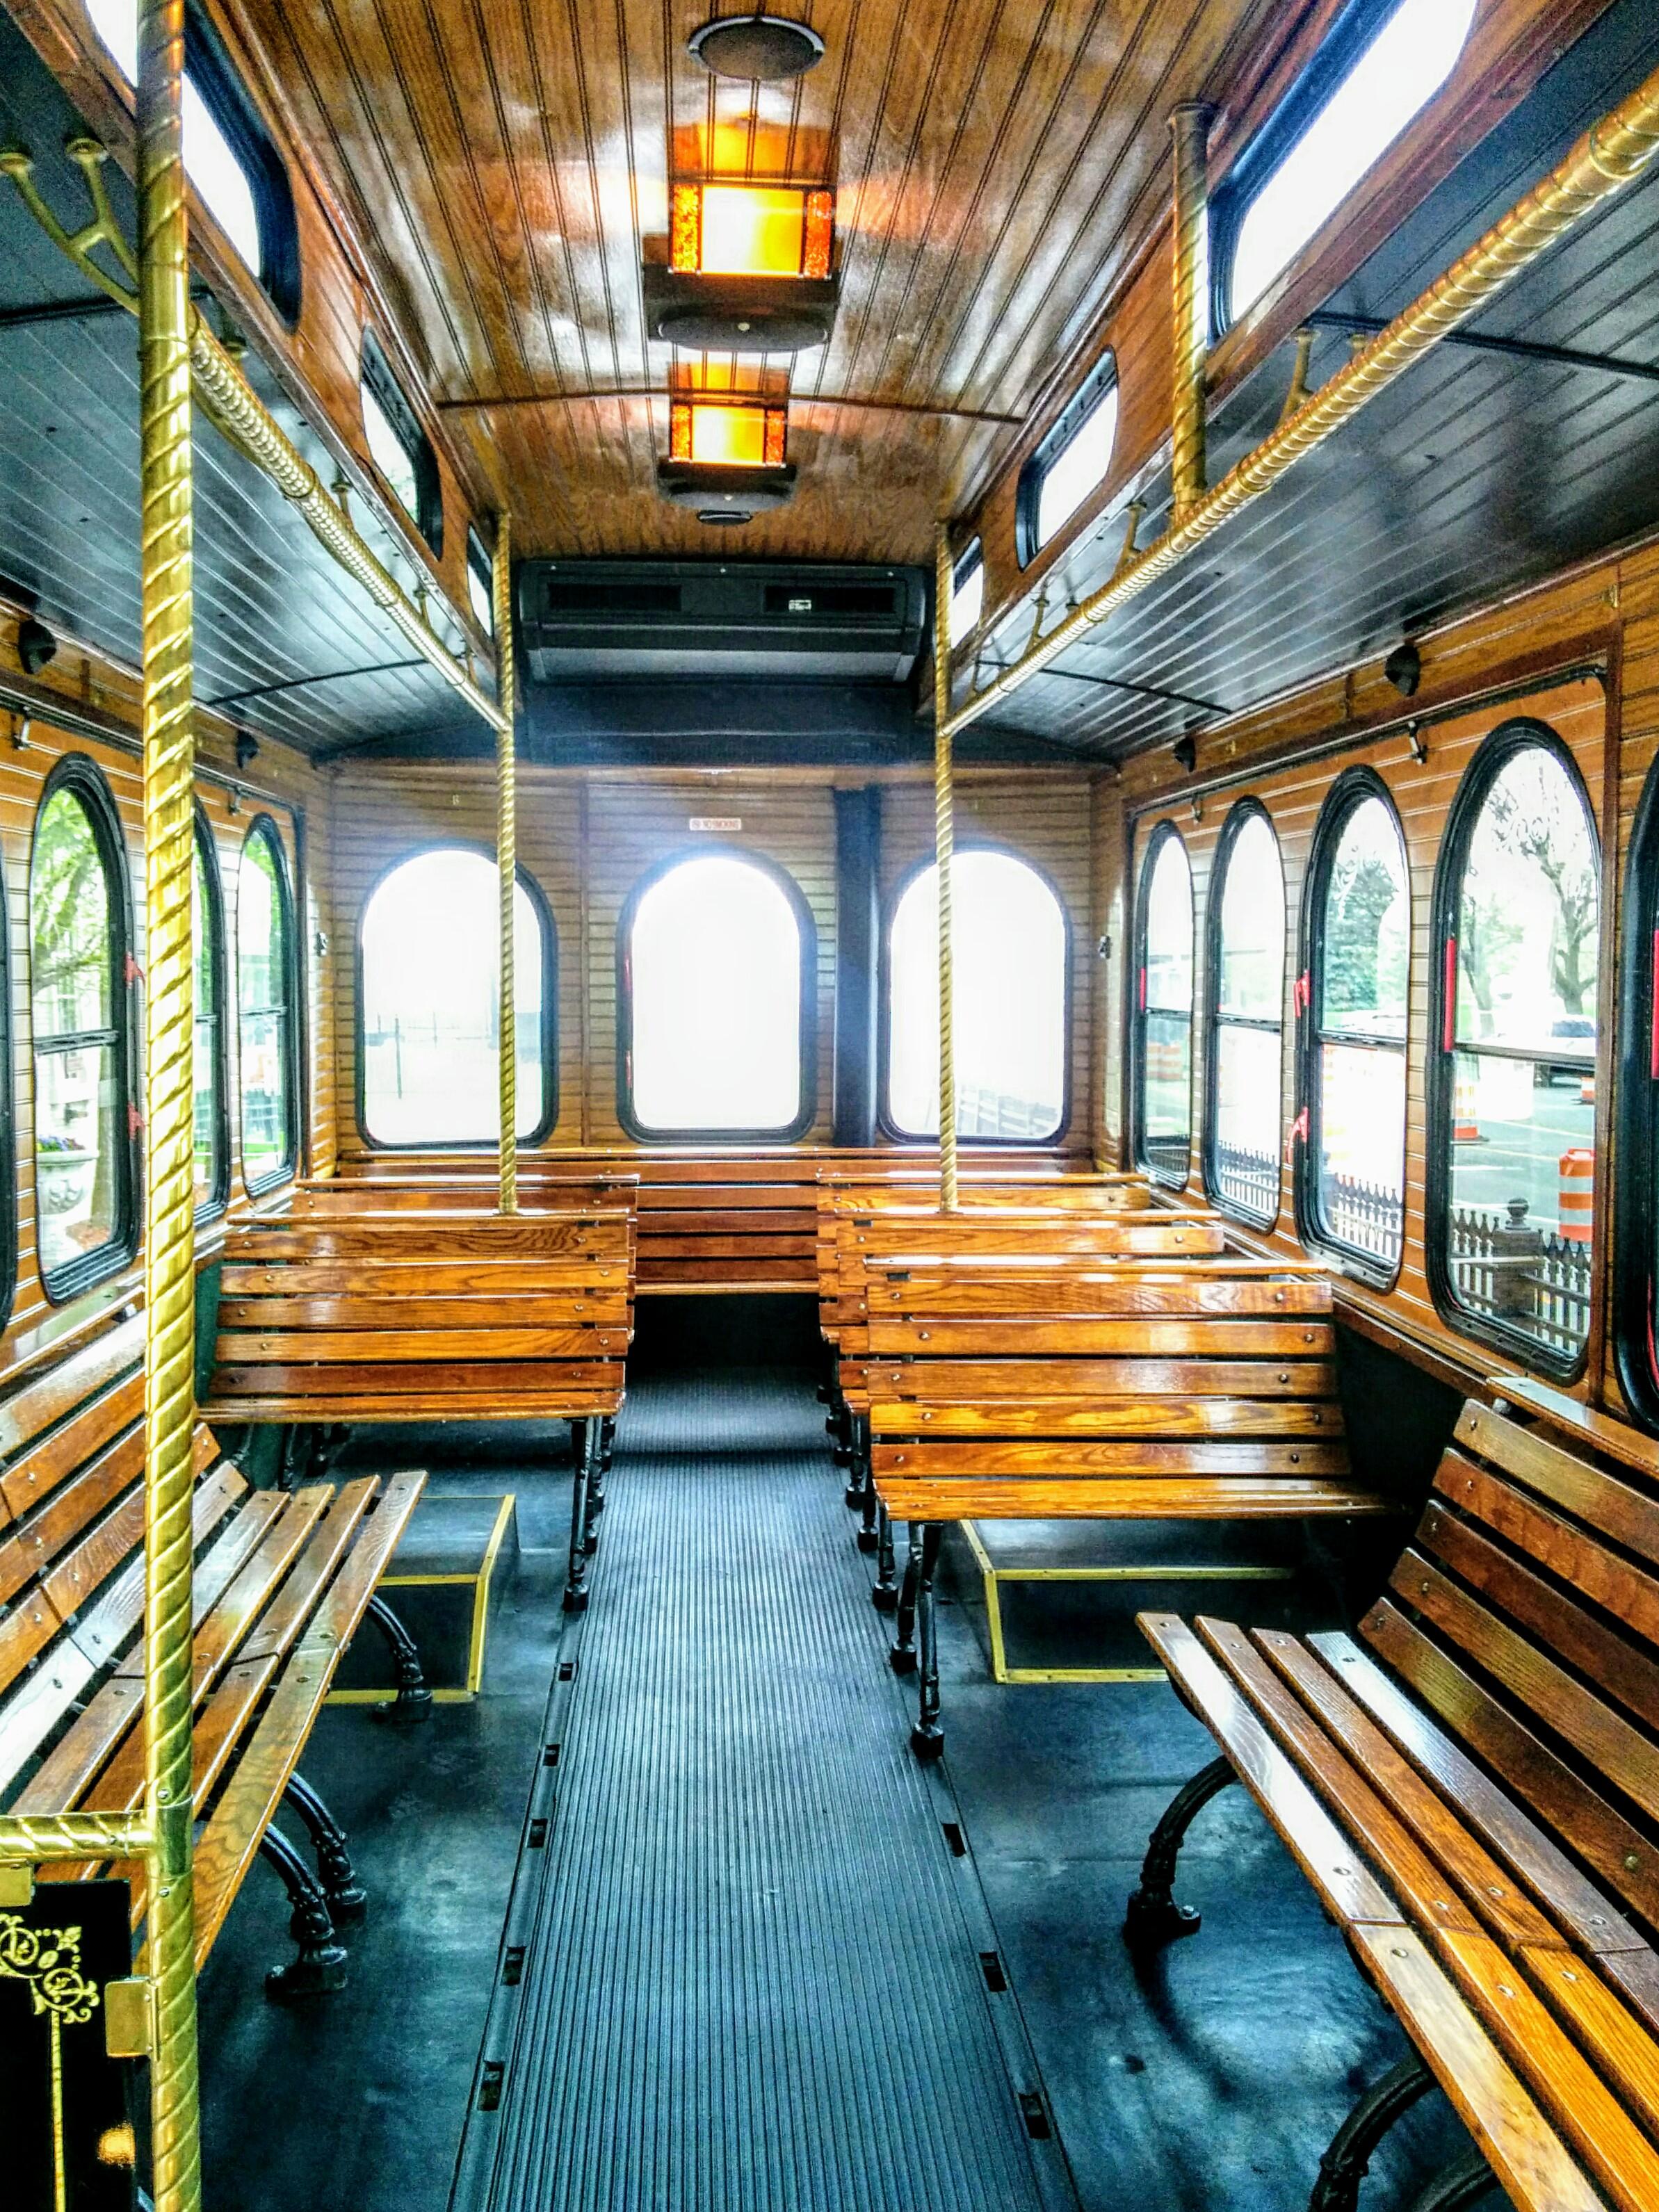 trolley interior April 2019.jpg